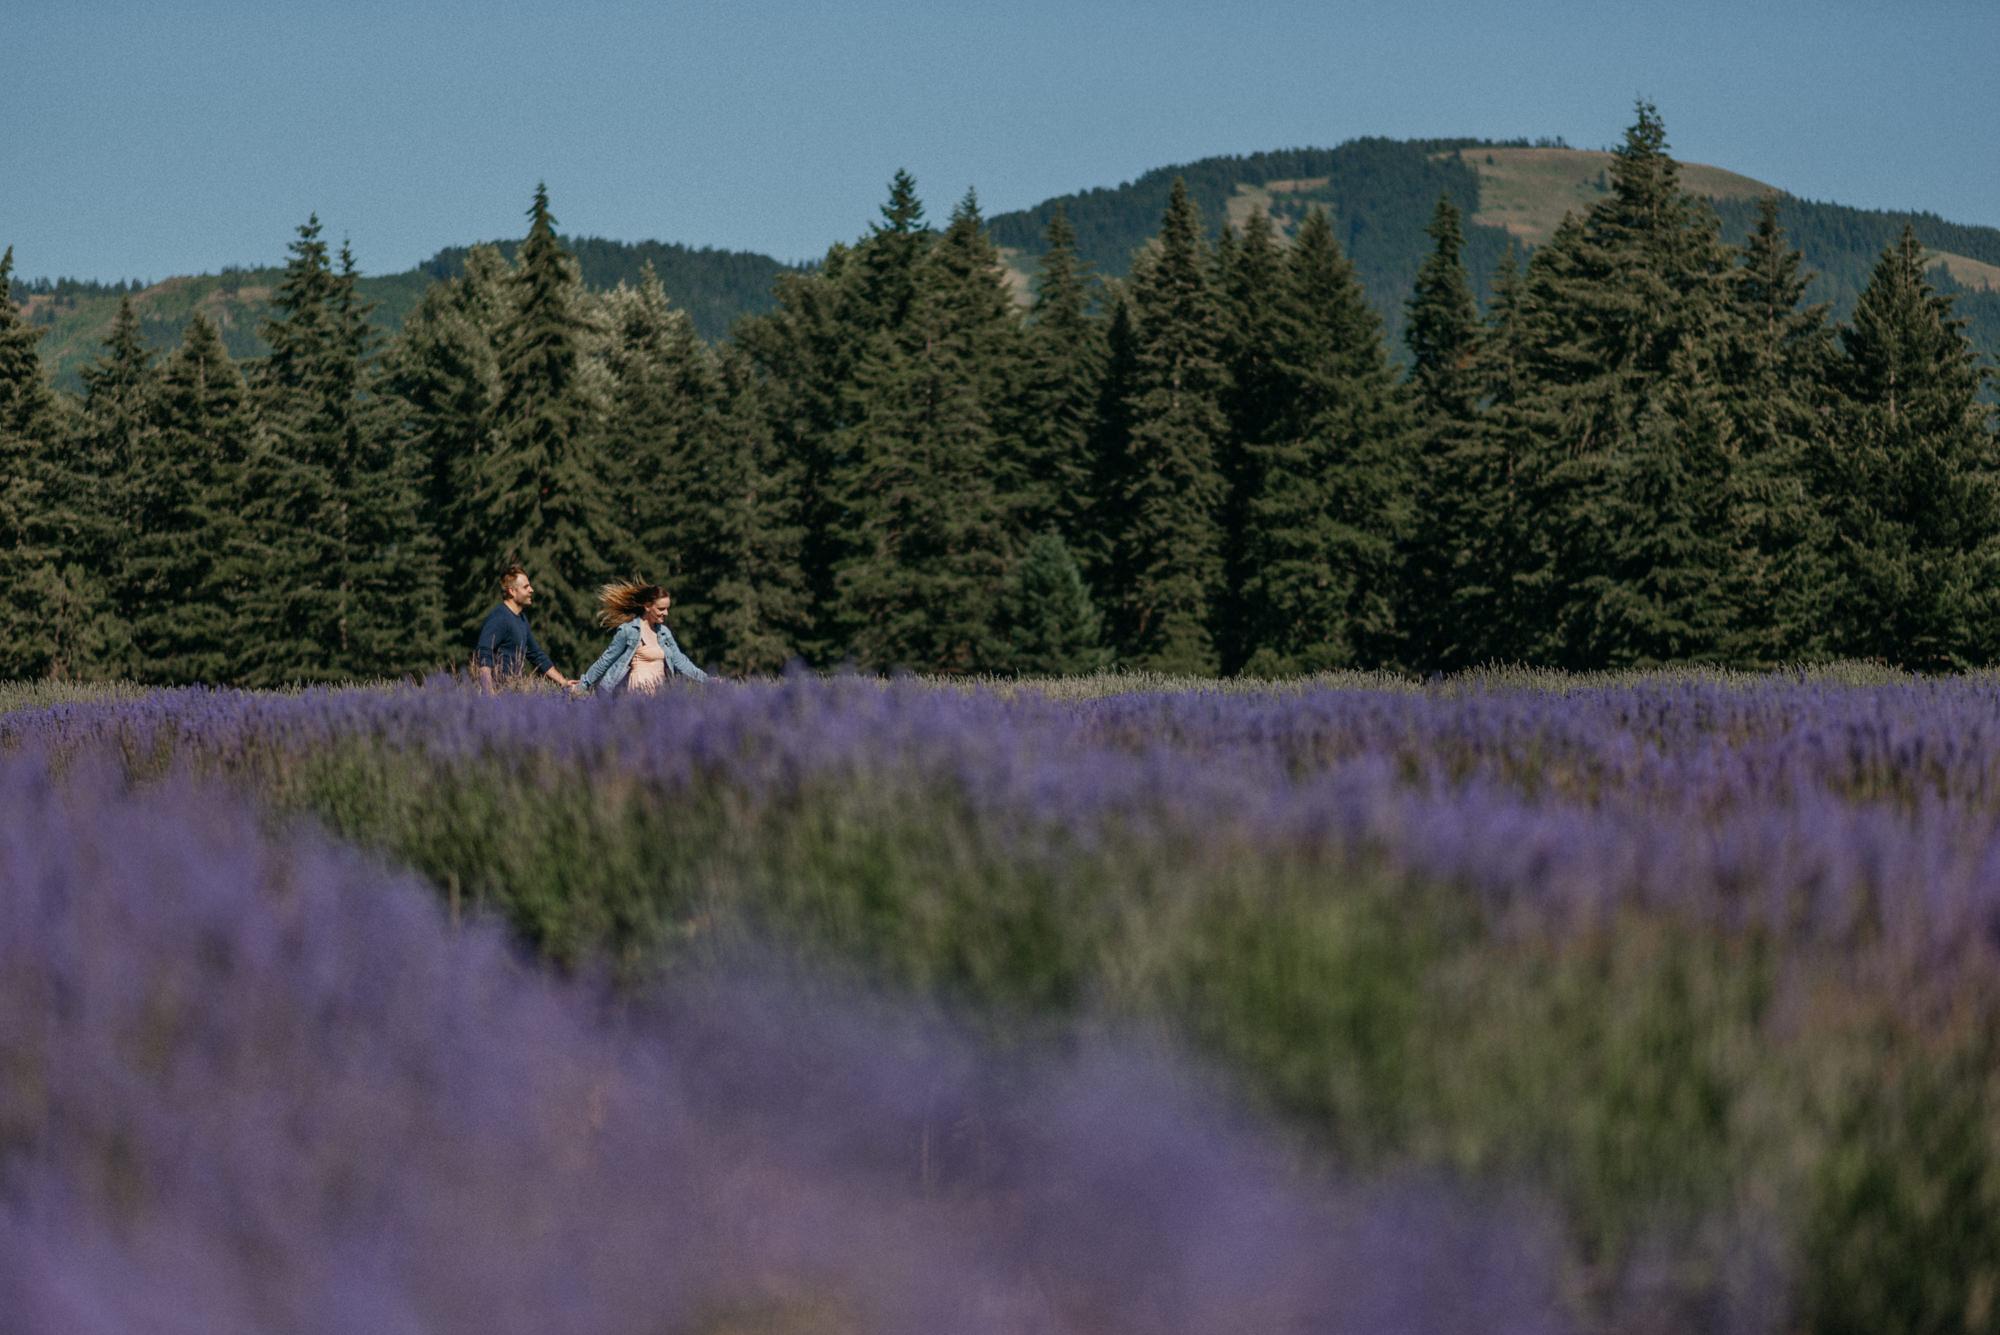 22-Mt-hood-lavender-farms-engagment-couple-summer-7569.jpg